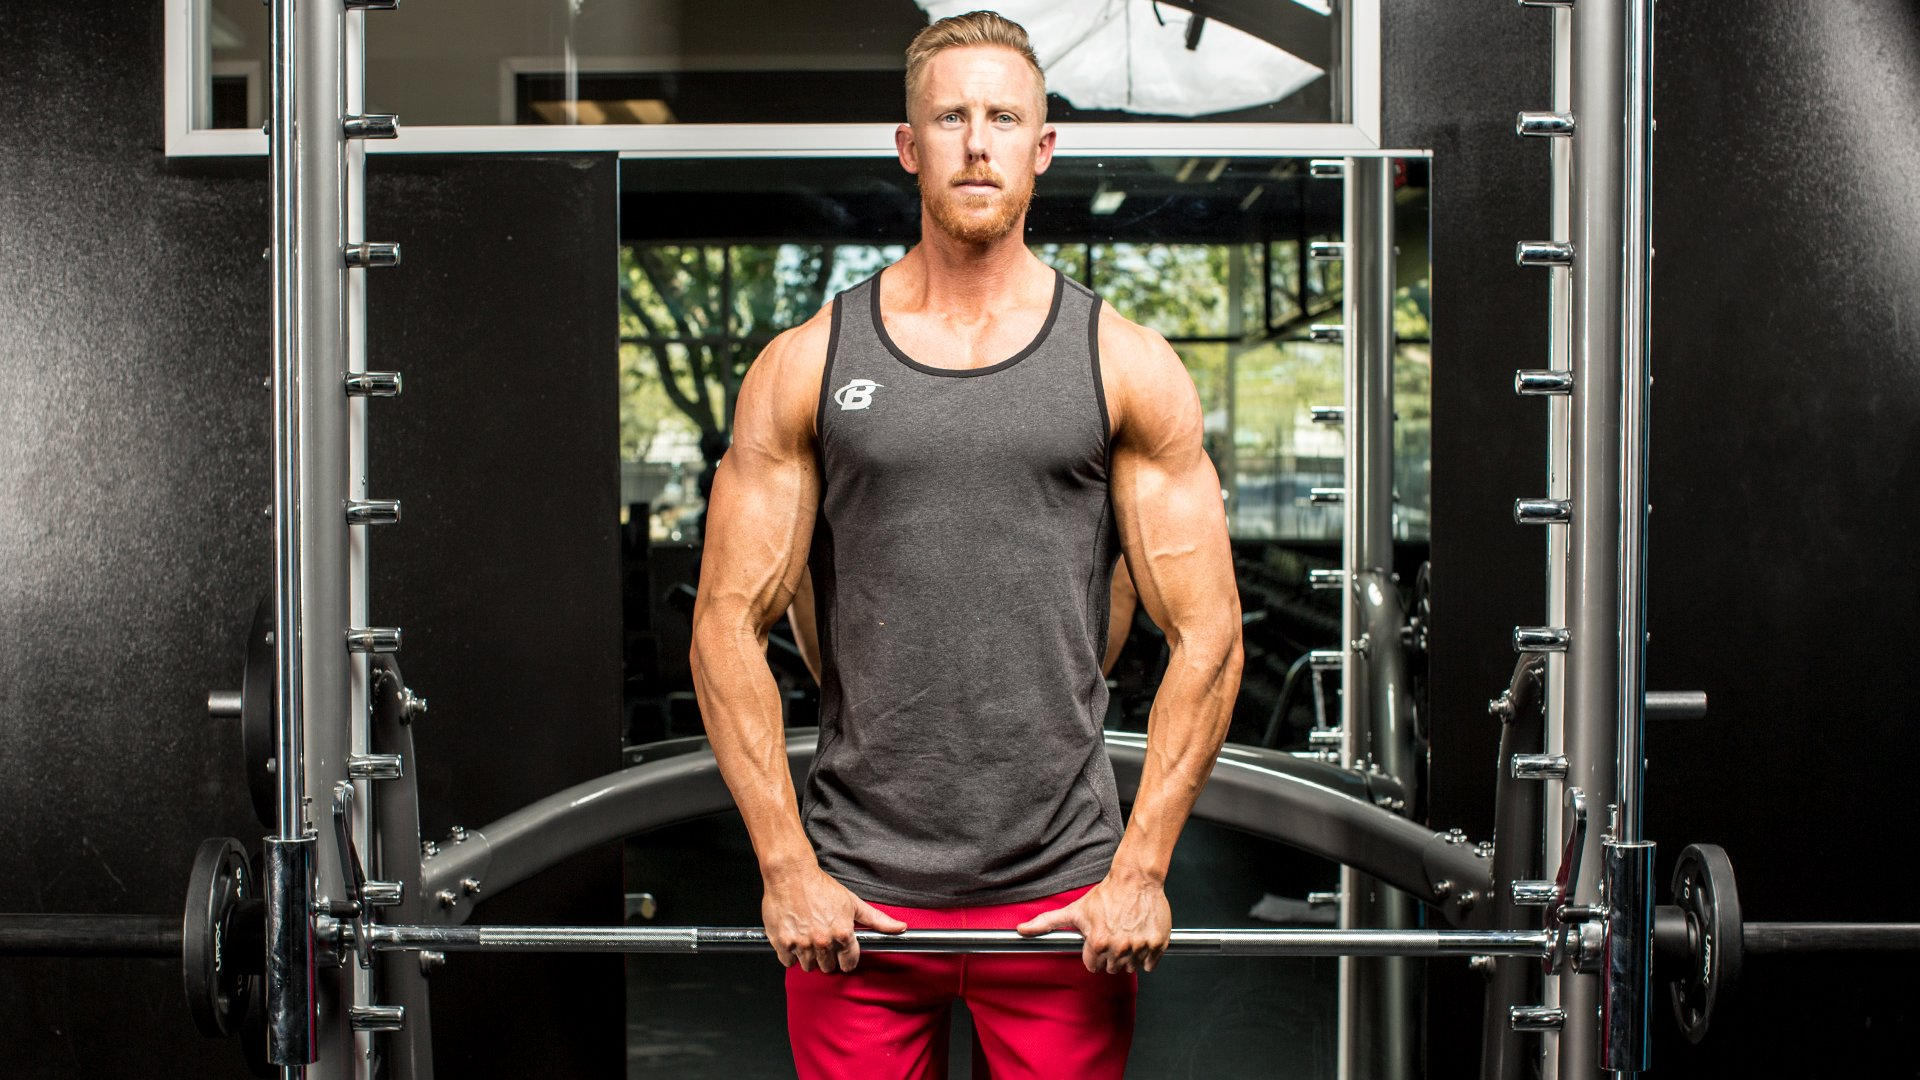 Shoulder Workouts For Men The 7 Best Routines For Bigger